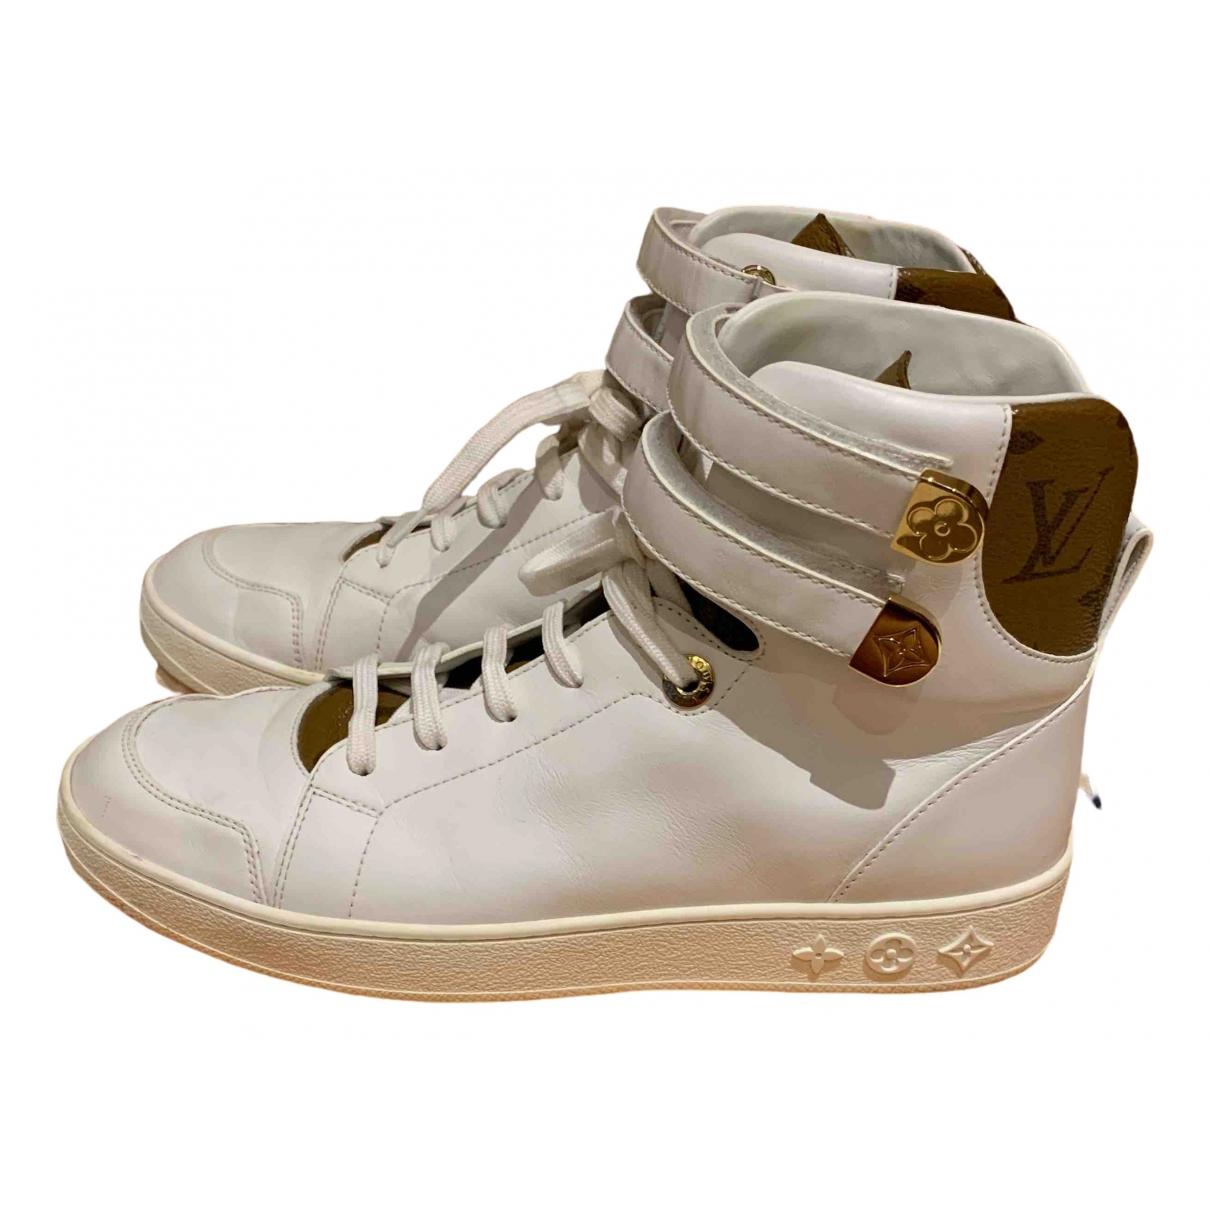 Louis Vuitton - Baskets Stellar pour femme en cuir - blanc